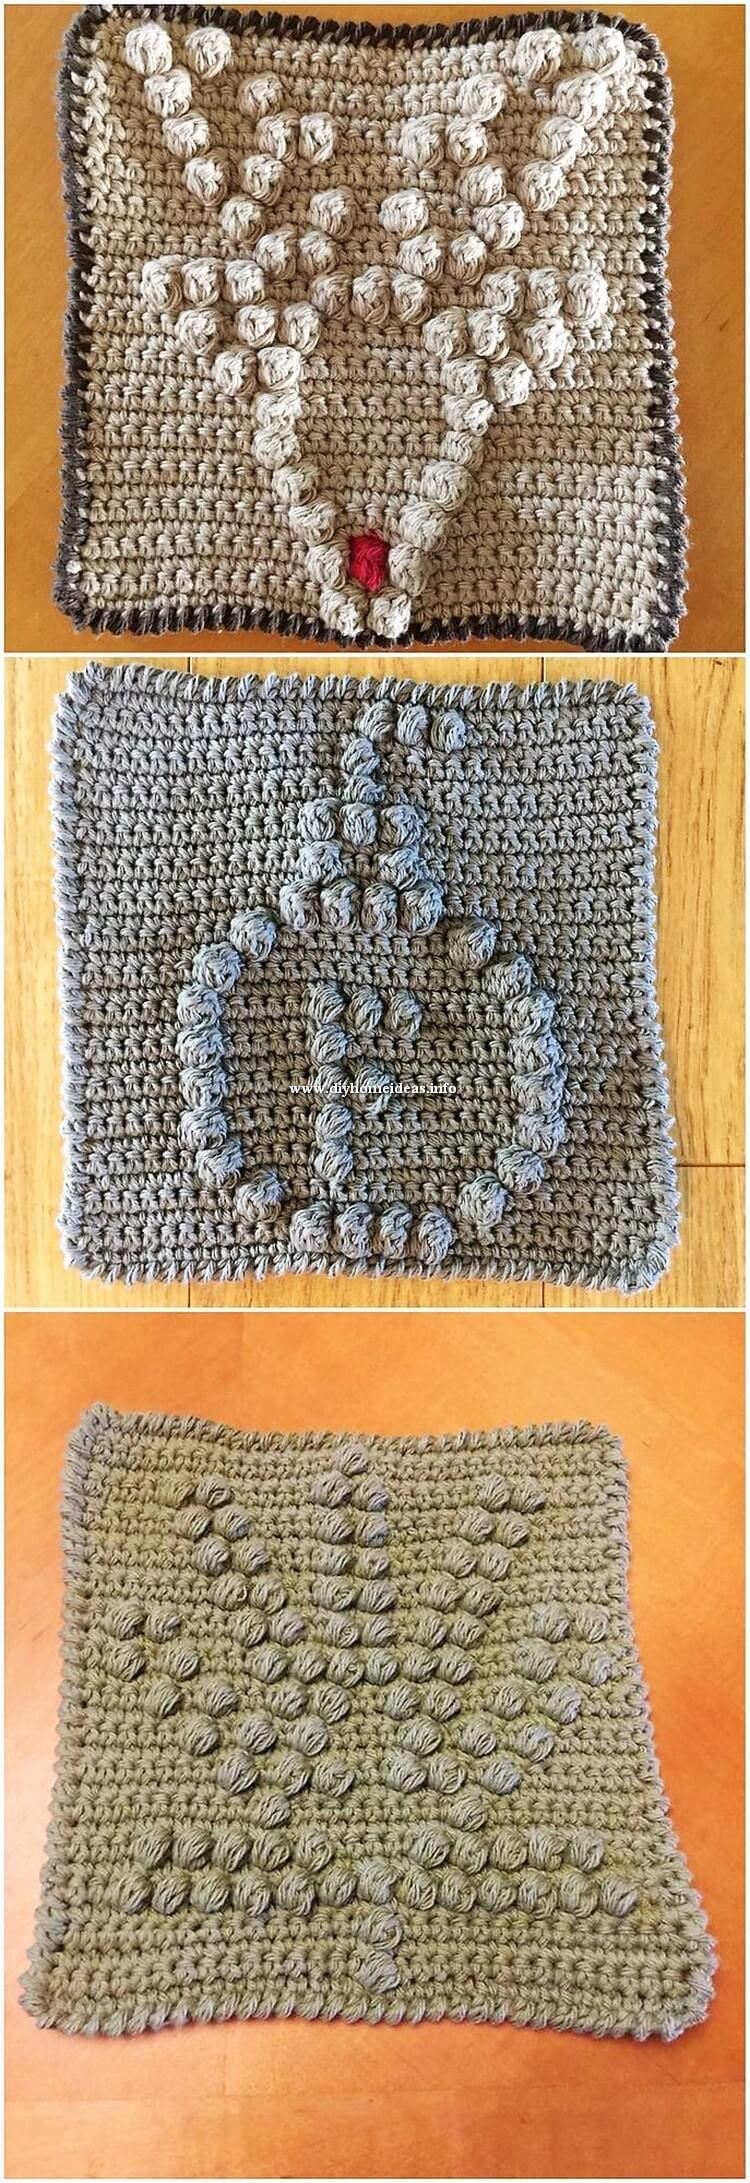 Crochet Creation